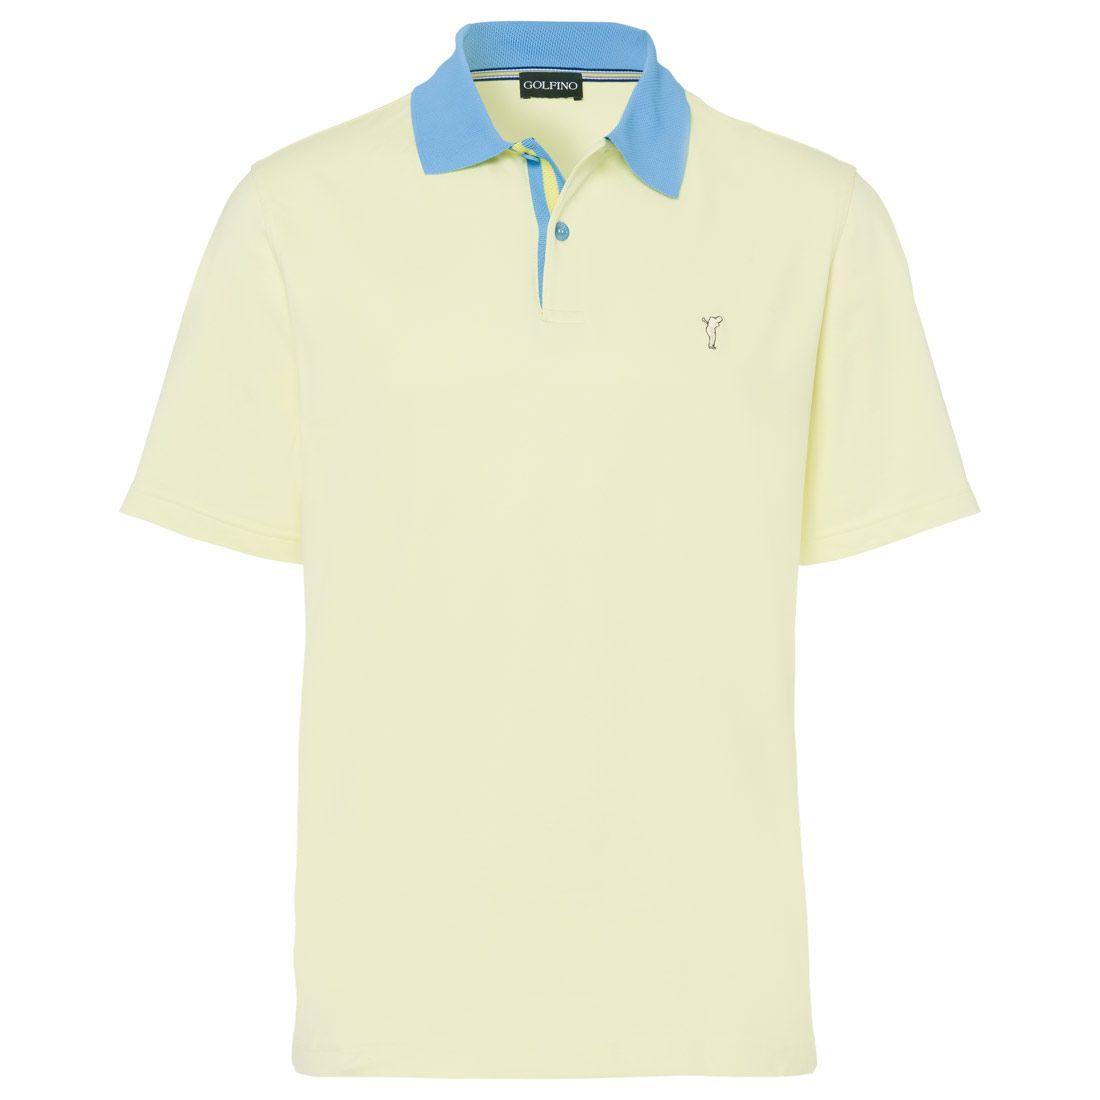 61ec48d9 Men's contrast collar polo #golfino #golfwear #golfclothing #golfbekleidung  #golf #fashion #2018 #men